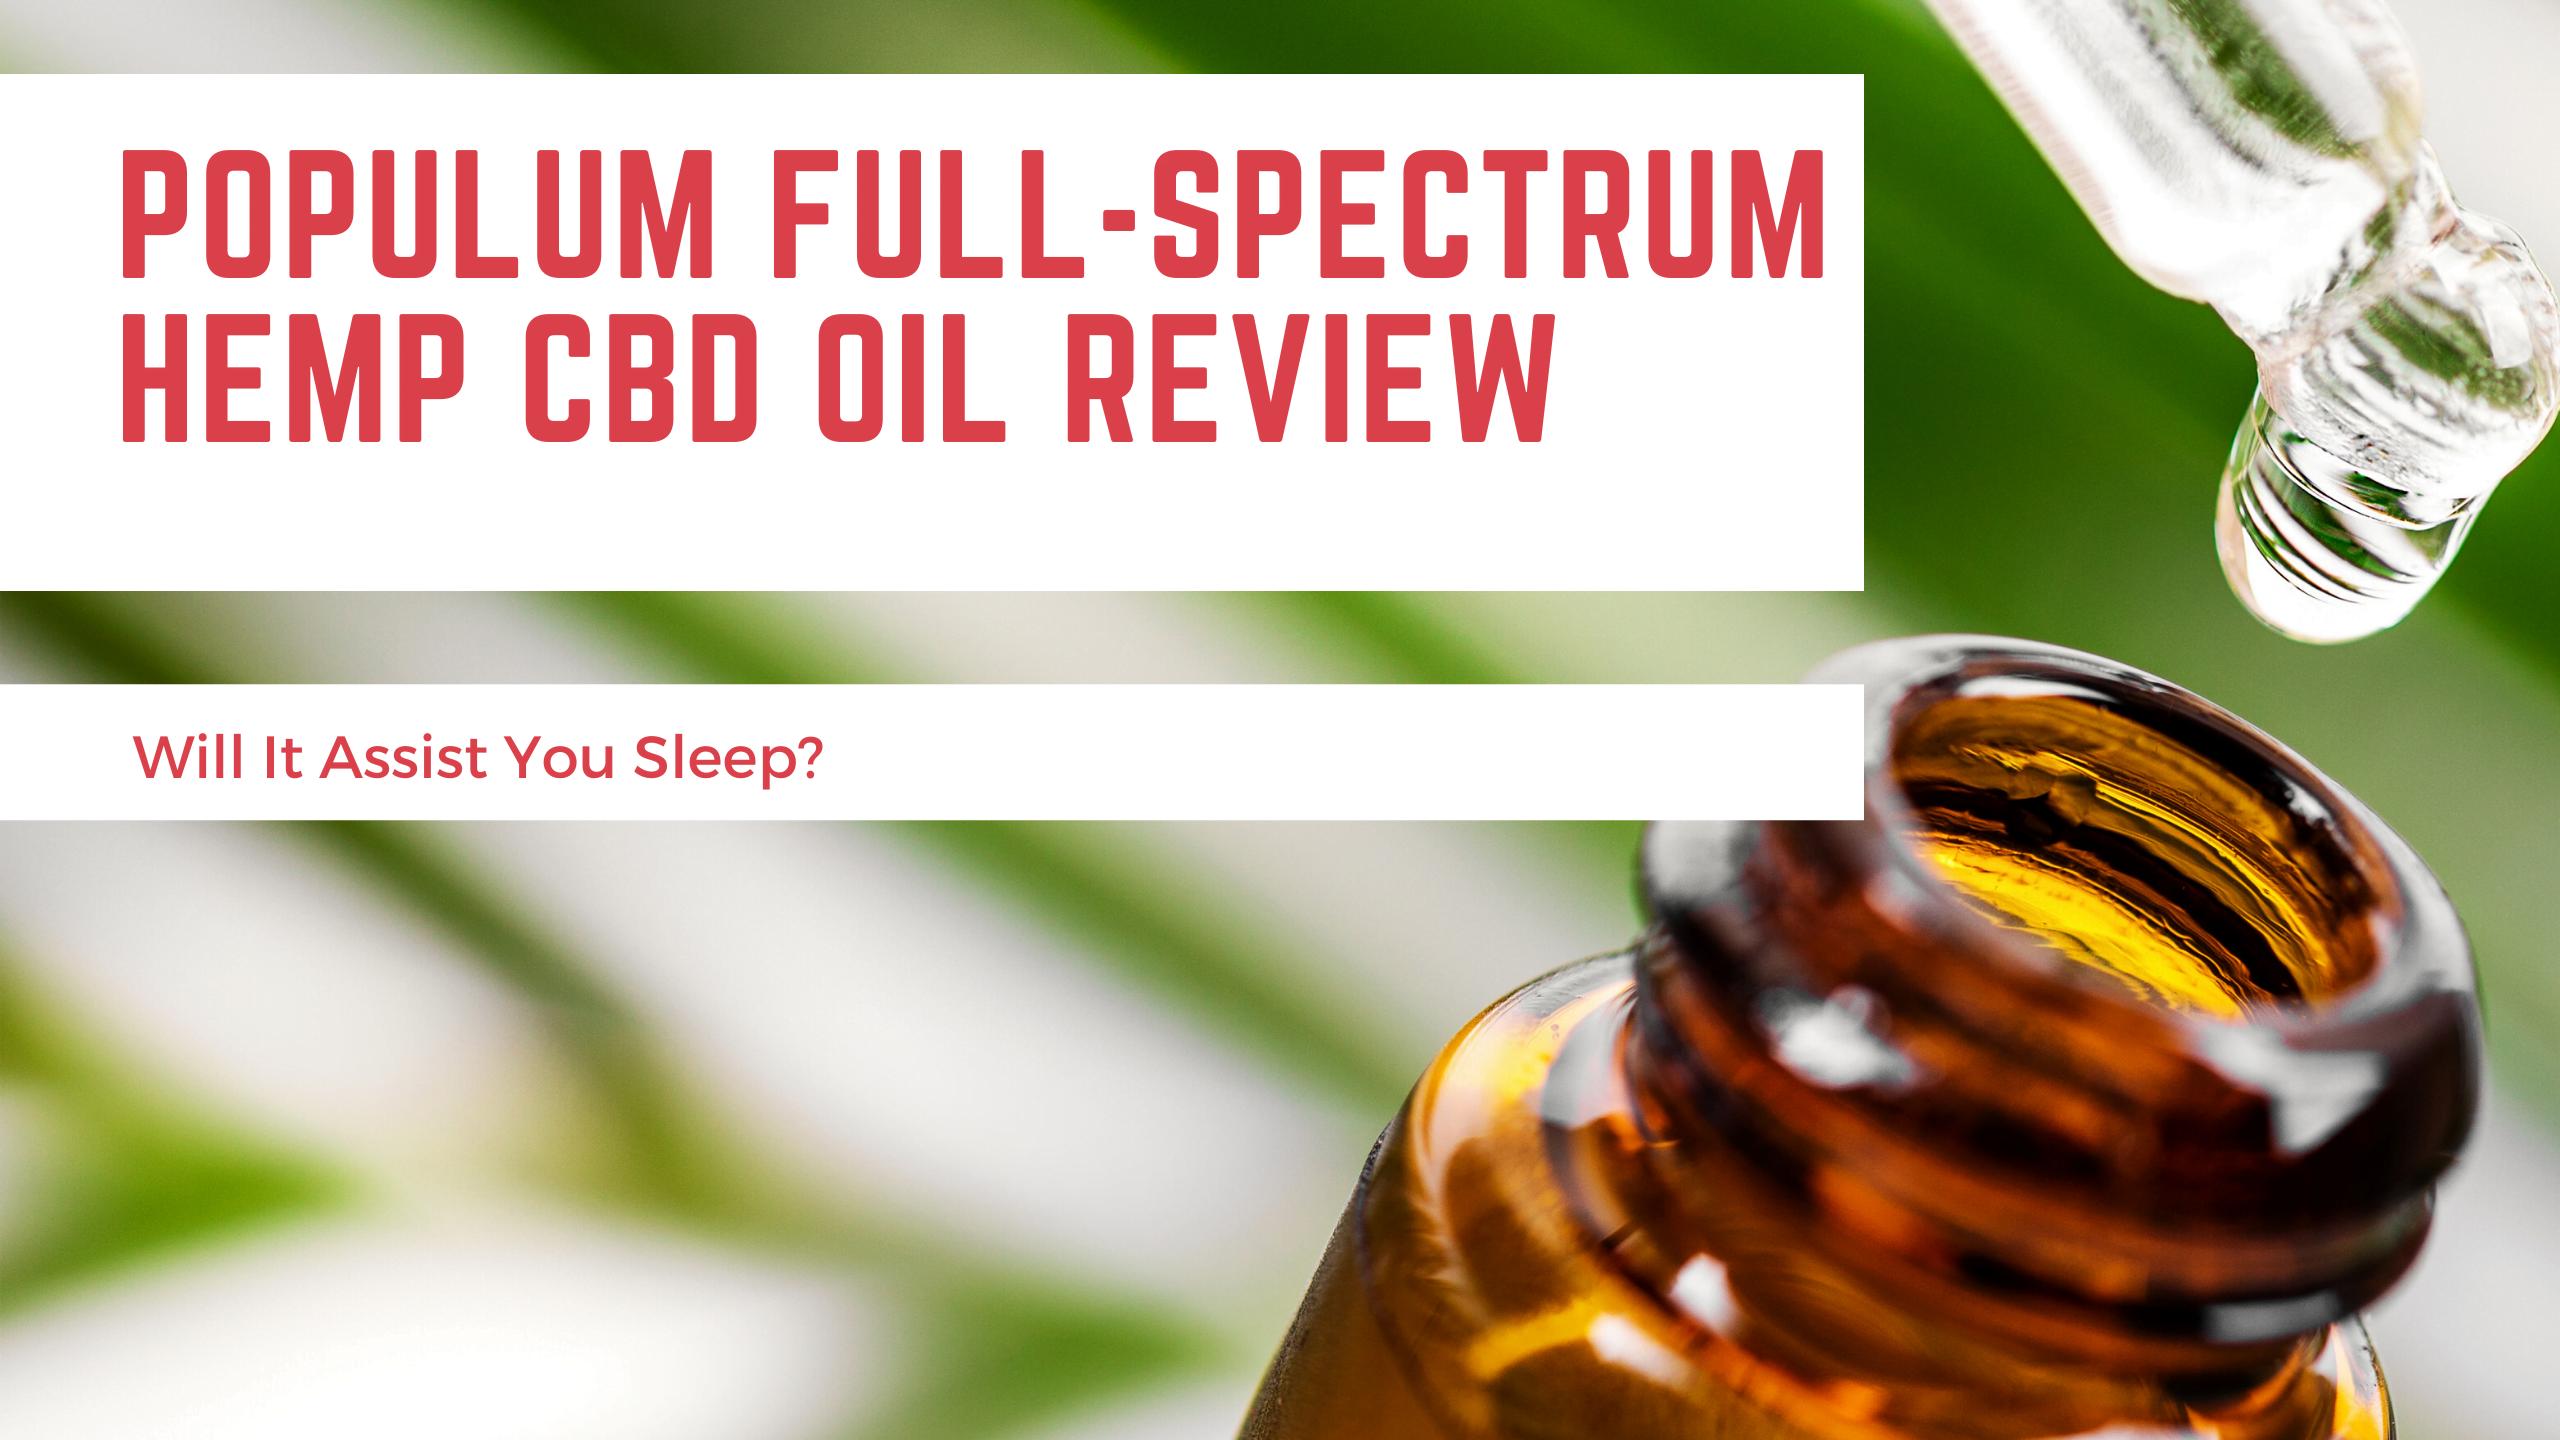 Populum Full-Spectrum Hemp CBD Oil Review – Will It Assist You Sleep?